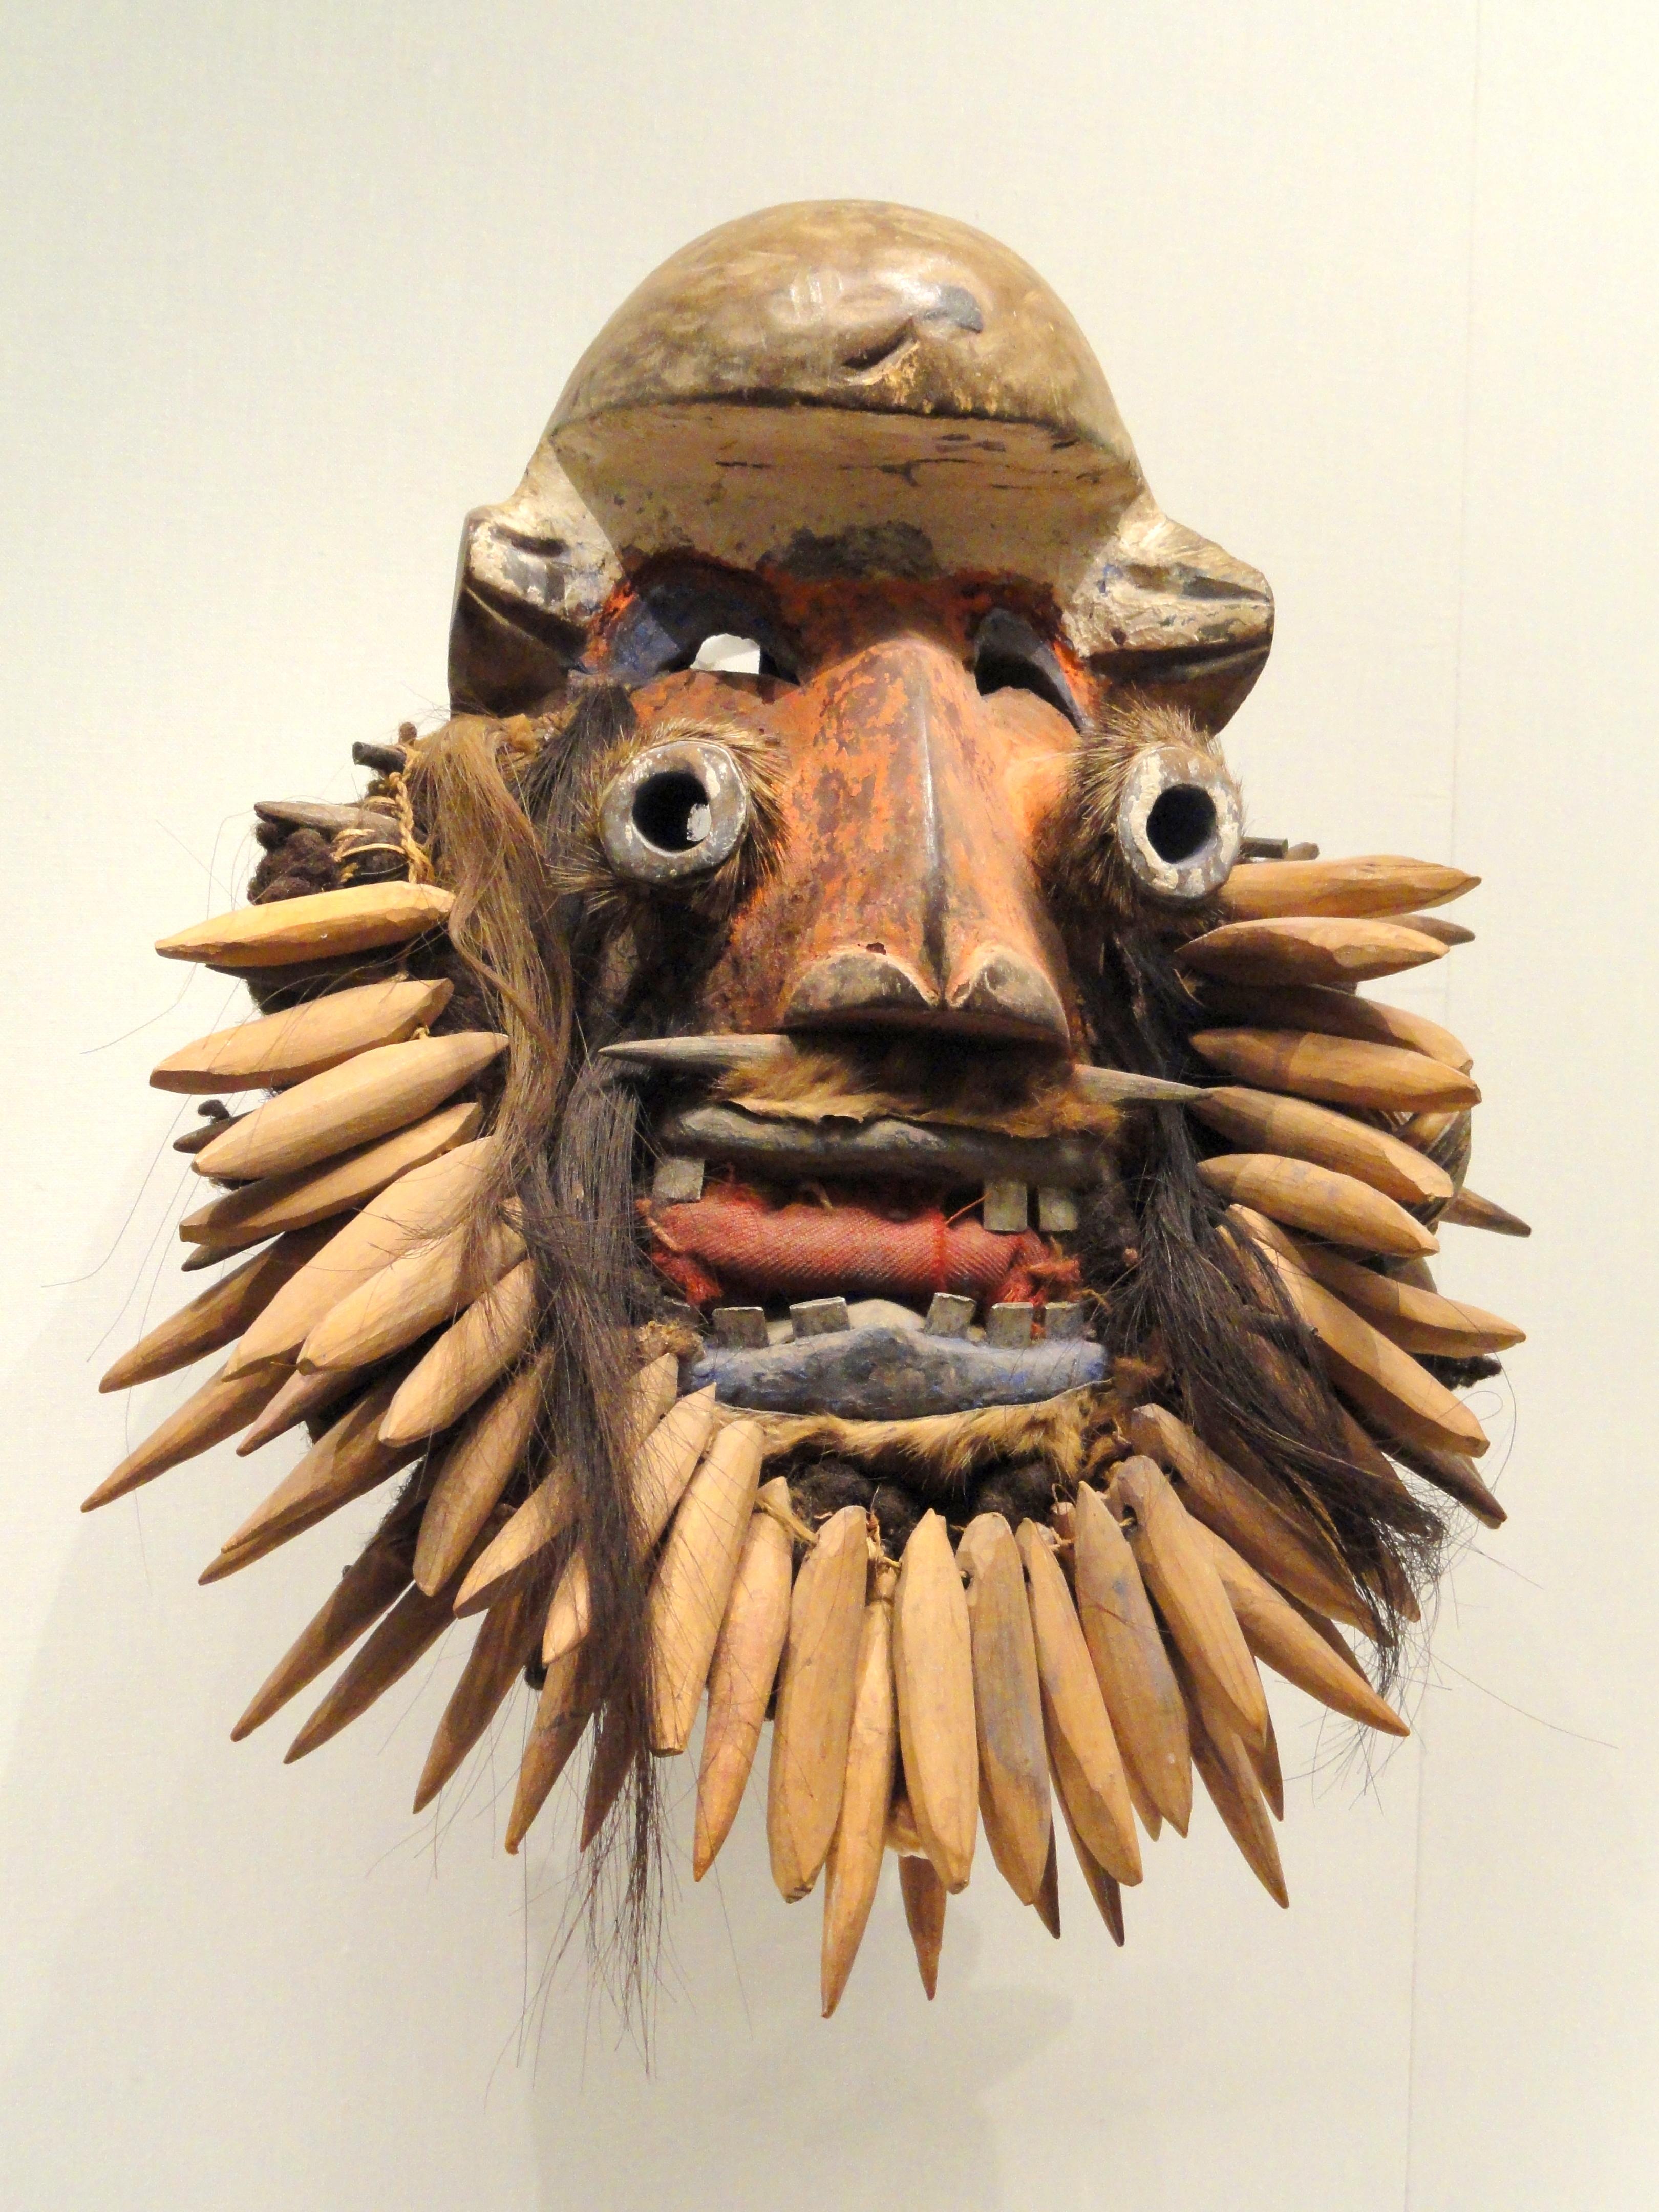 fileface mask early 1900s guinea coast ivory coast or